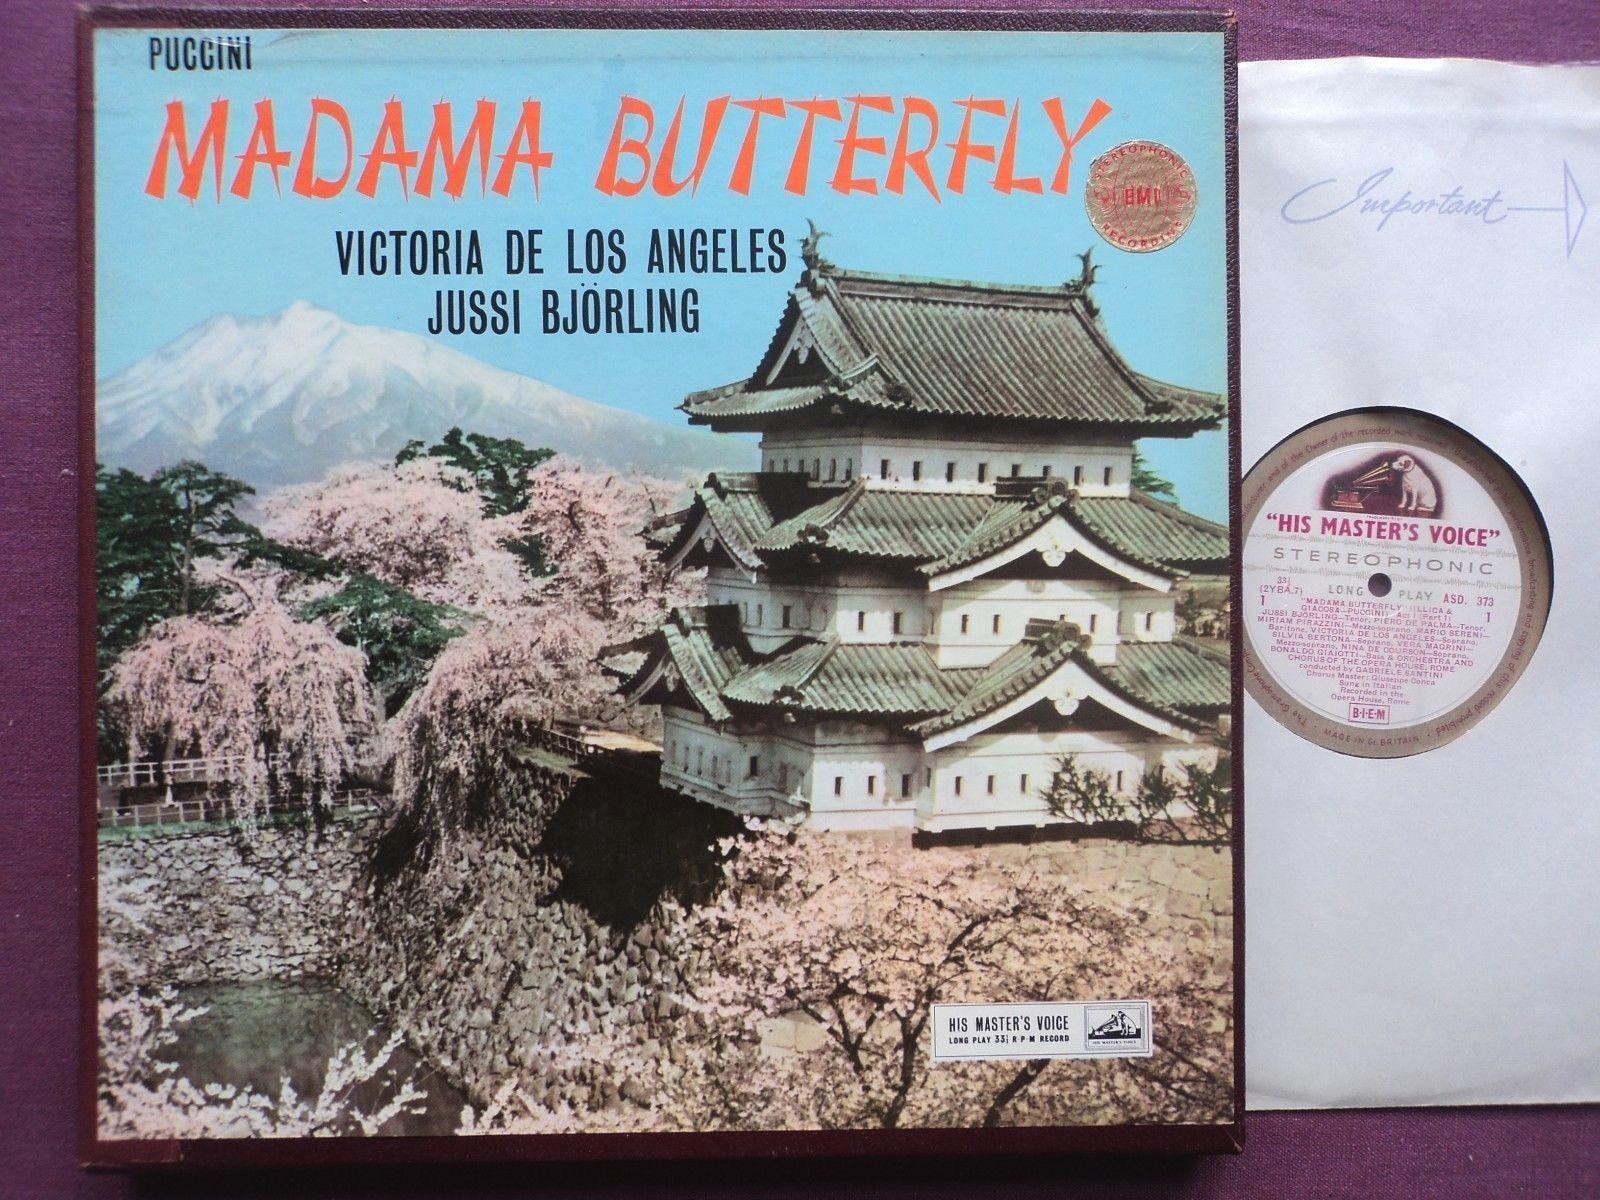 ASD 373-5, g/c UK orig. PUCCINI: Madame Butterfly, DE LOS ANGELES, BJÖRLING, NM